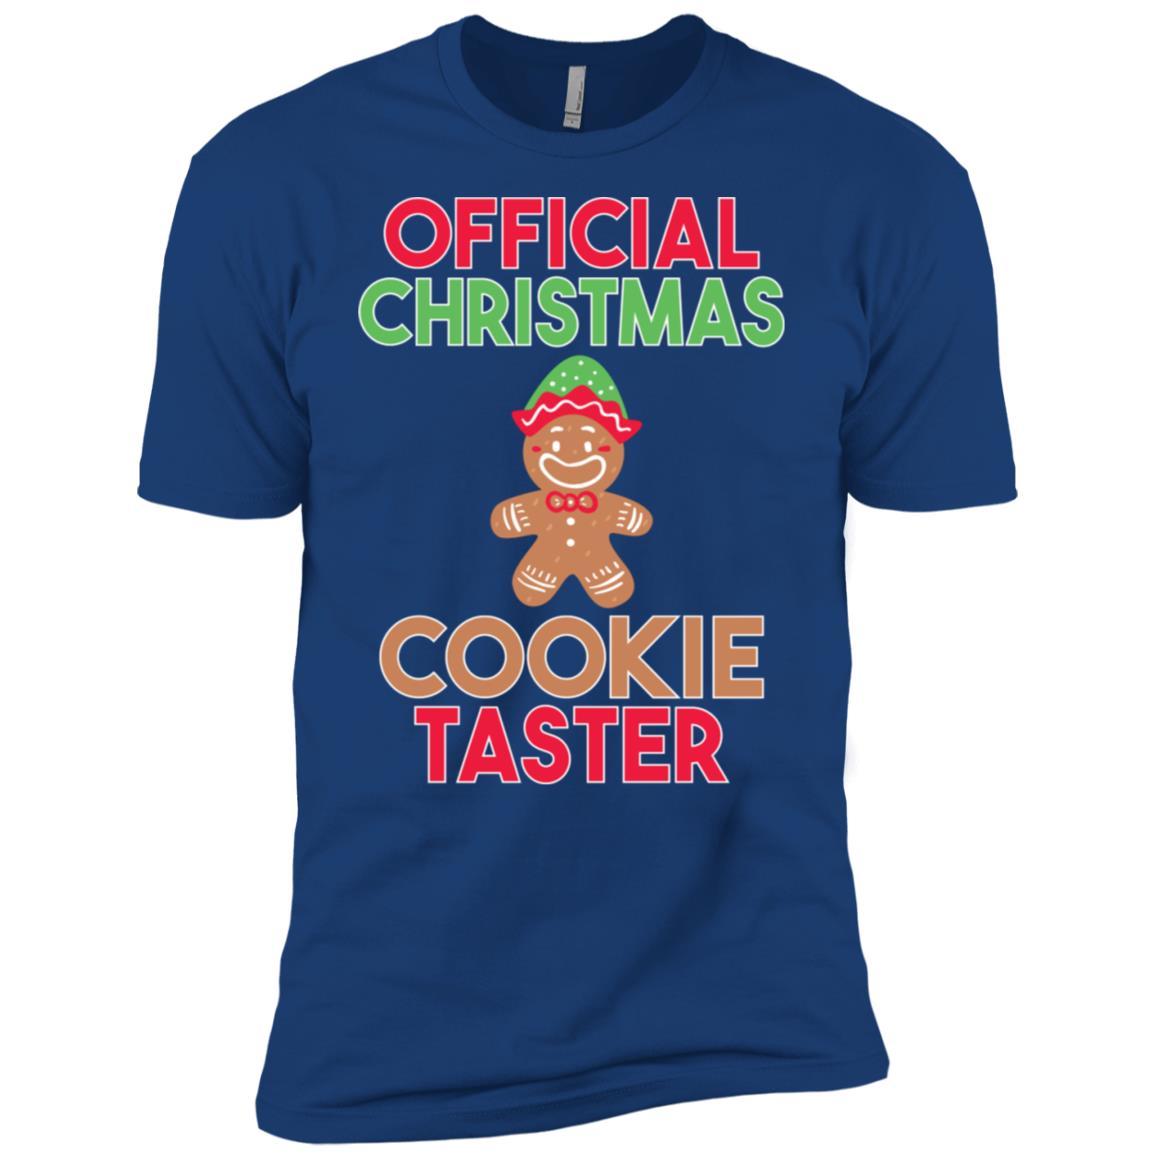 Official Christmas Cookie Taster Funny Christmas Men Short Sleeve T-Shirt